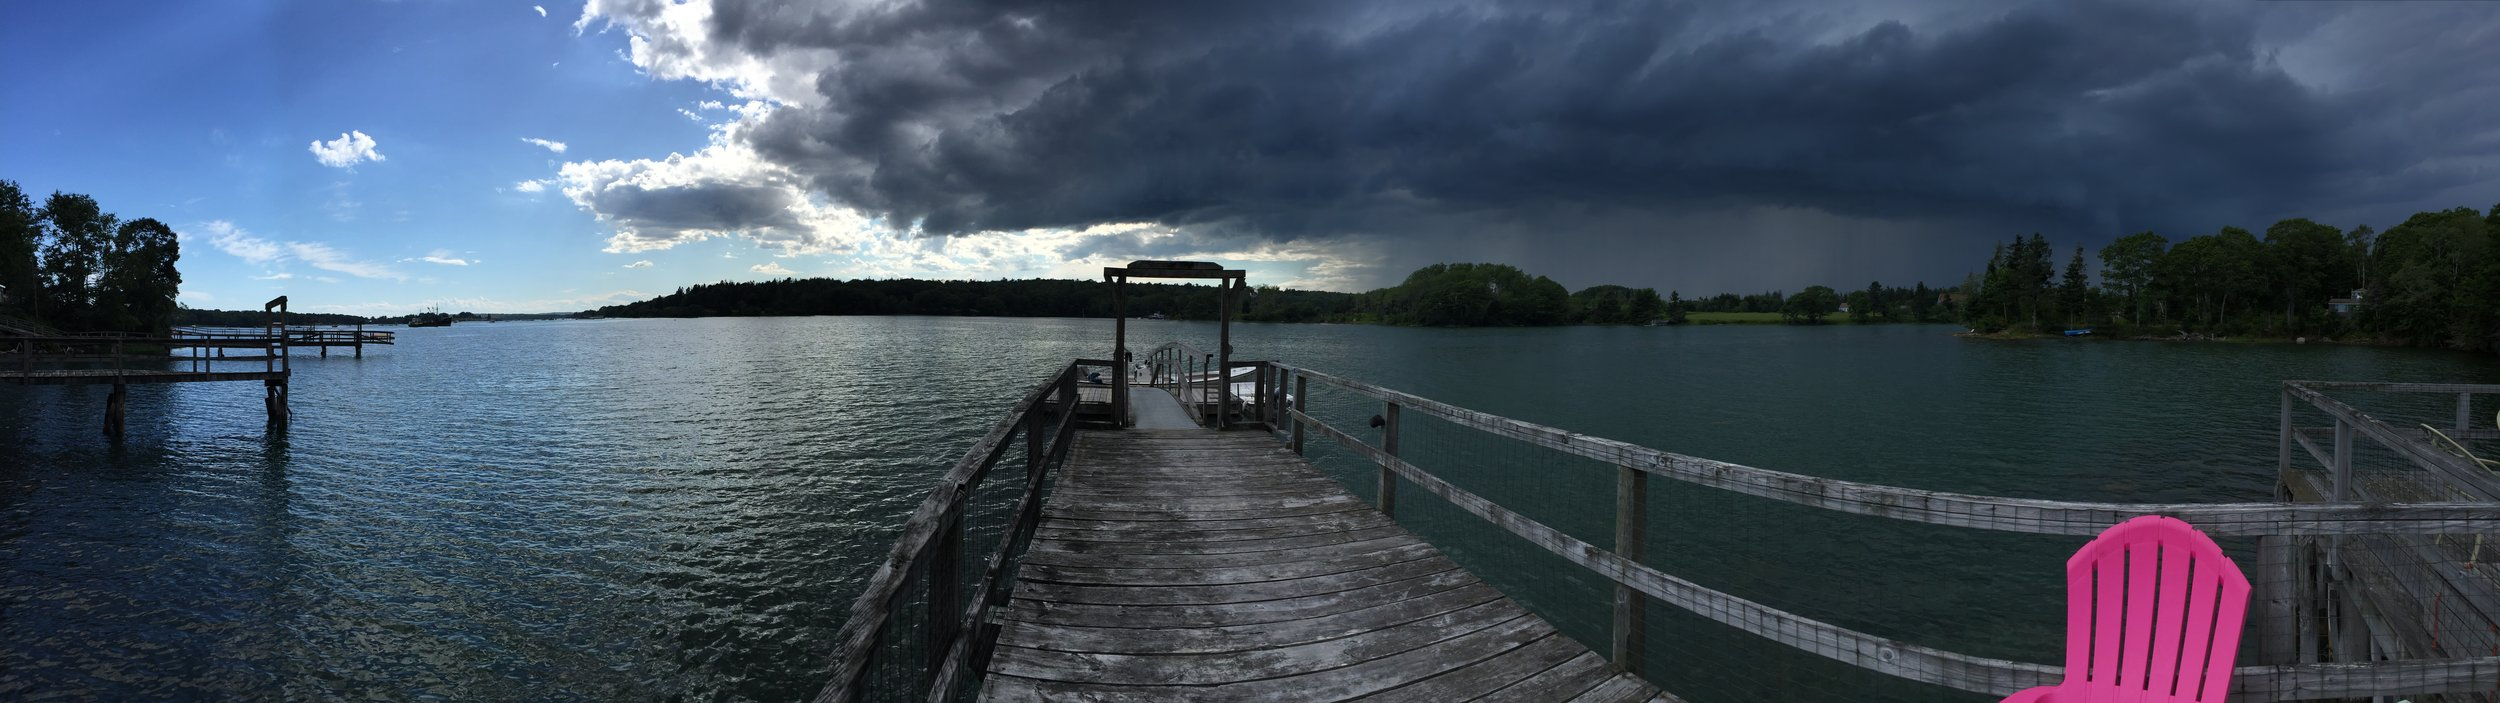 Storm-Sun on the Dock.JPG